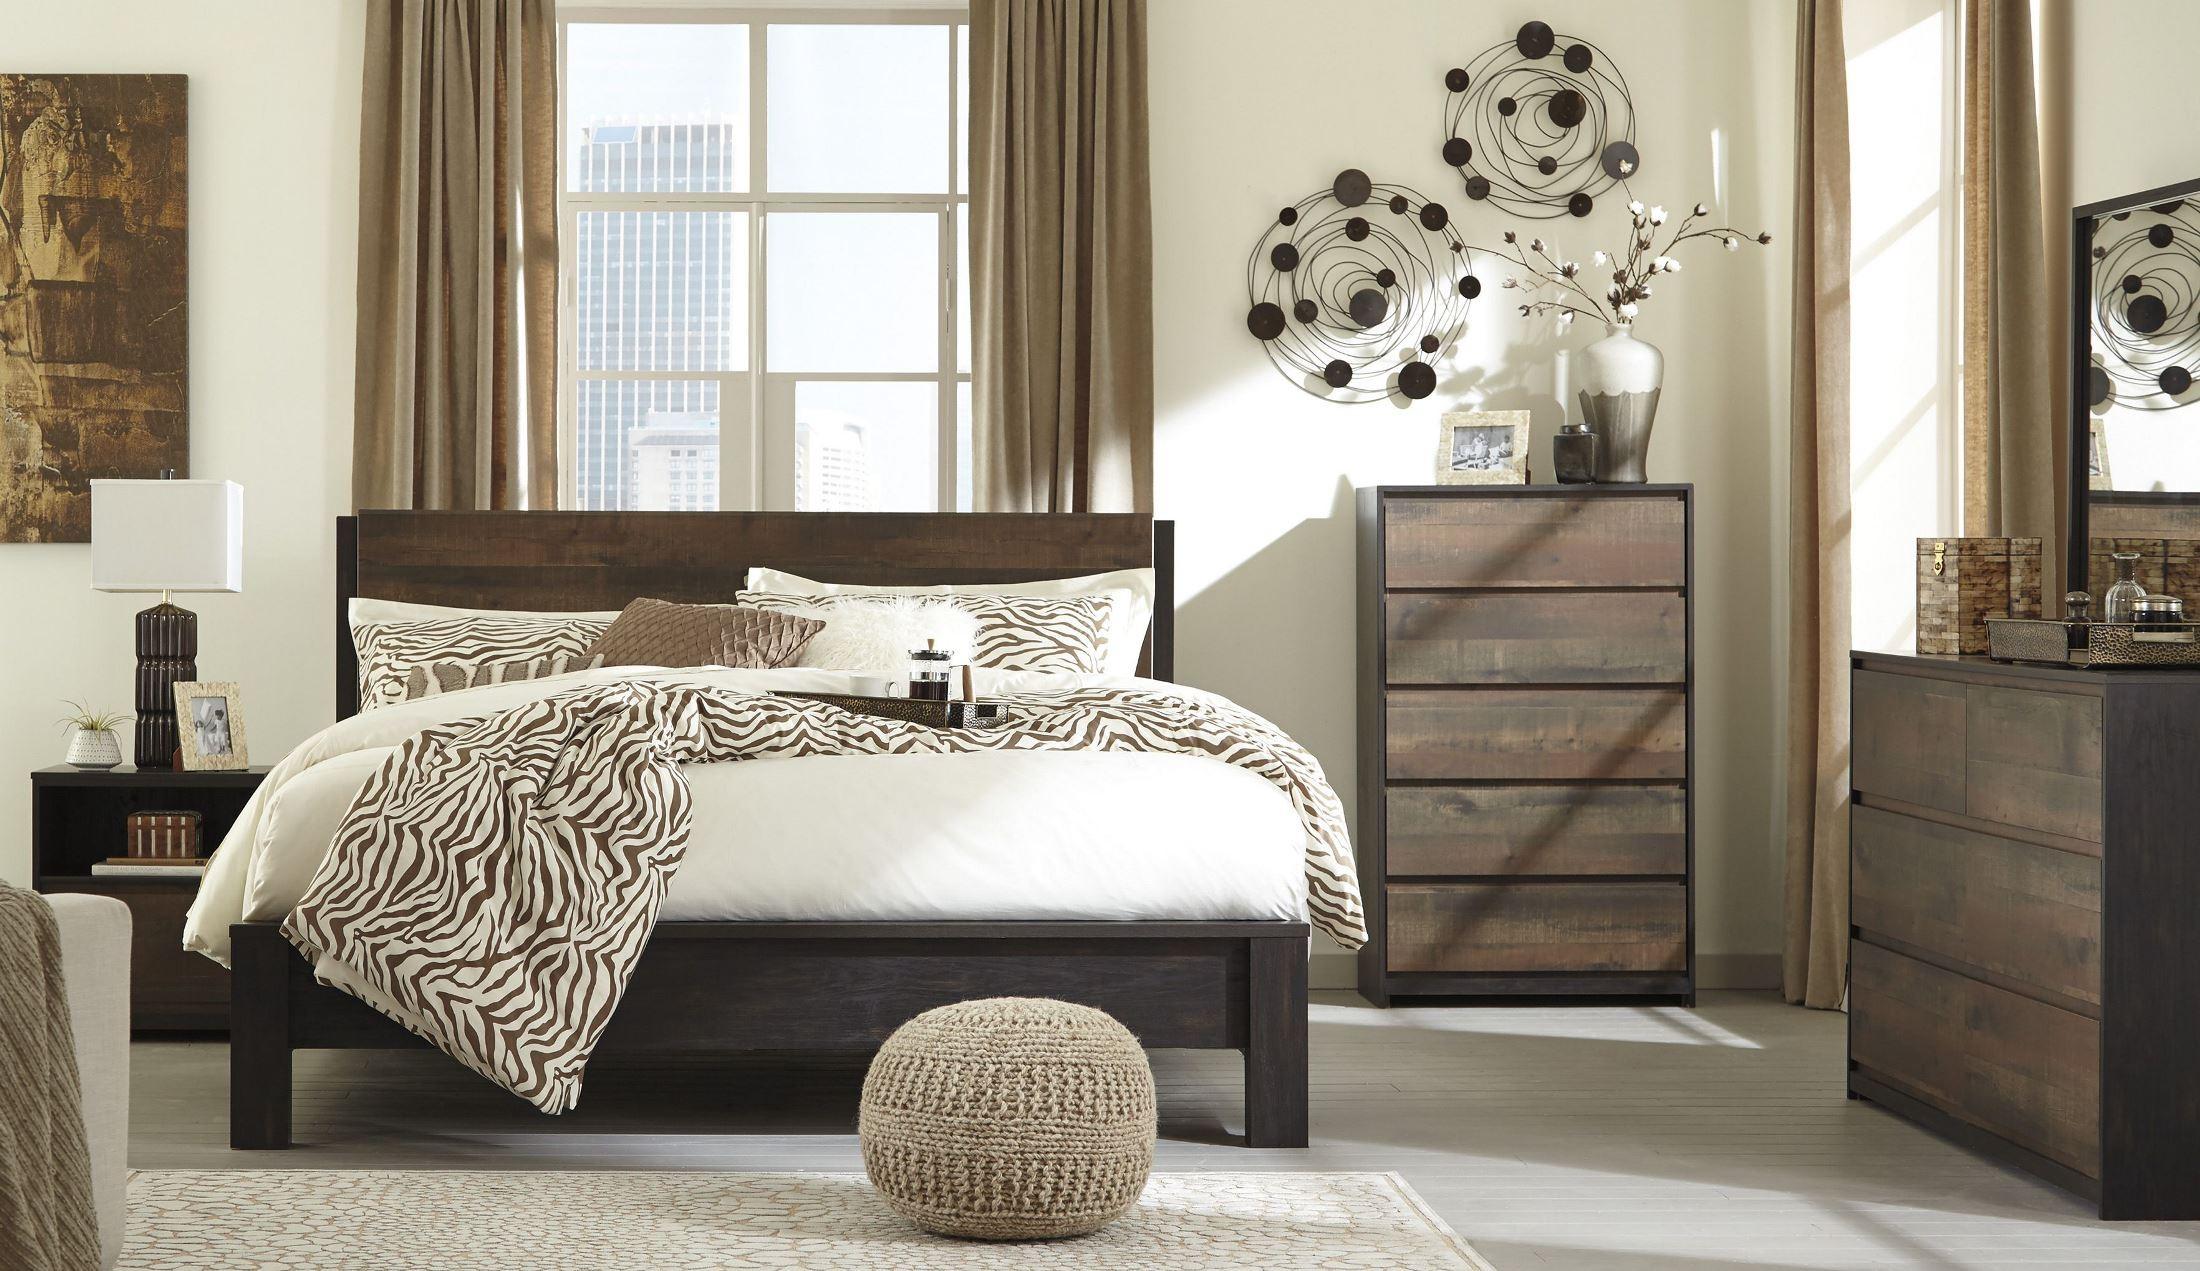 Windlore dark brown panel bedroom set b320 57 54 96 ashley for Dark brown bedroom furniture sets